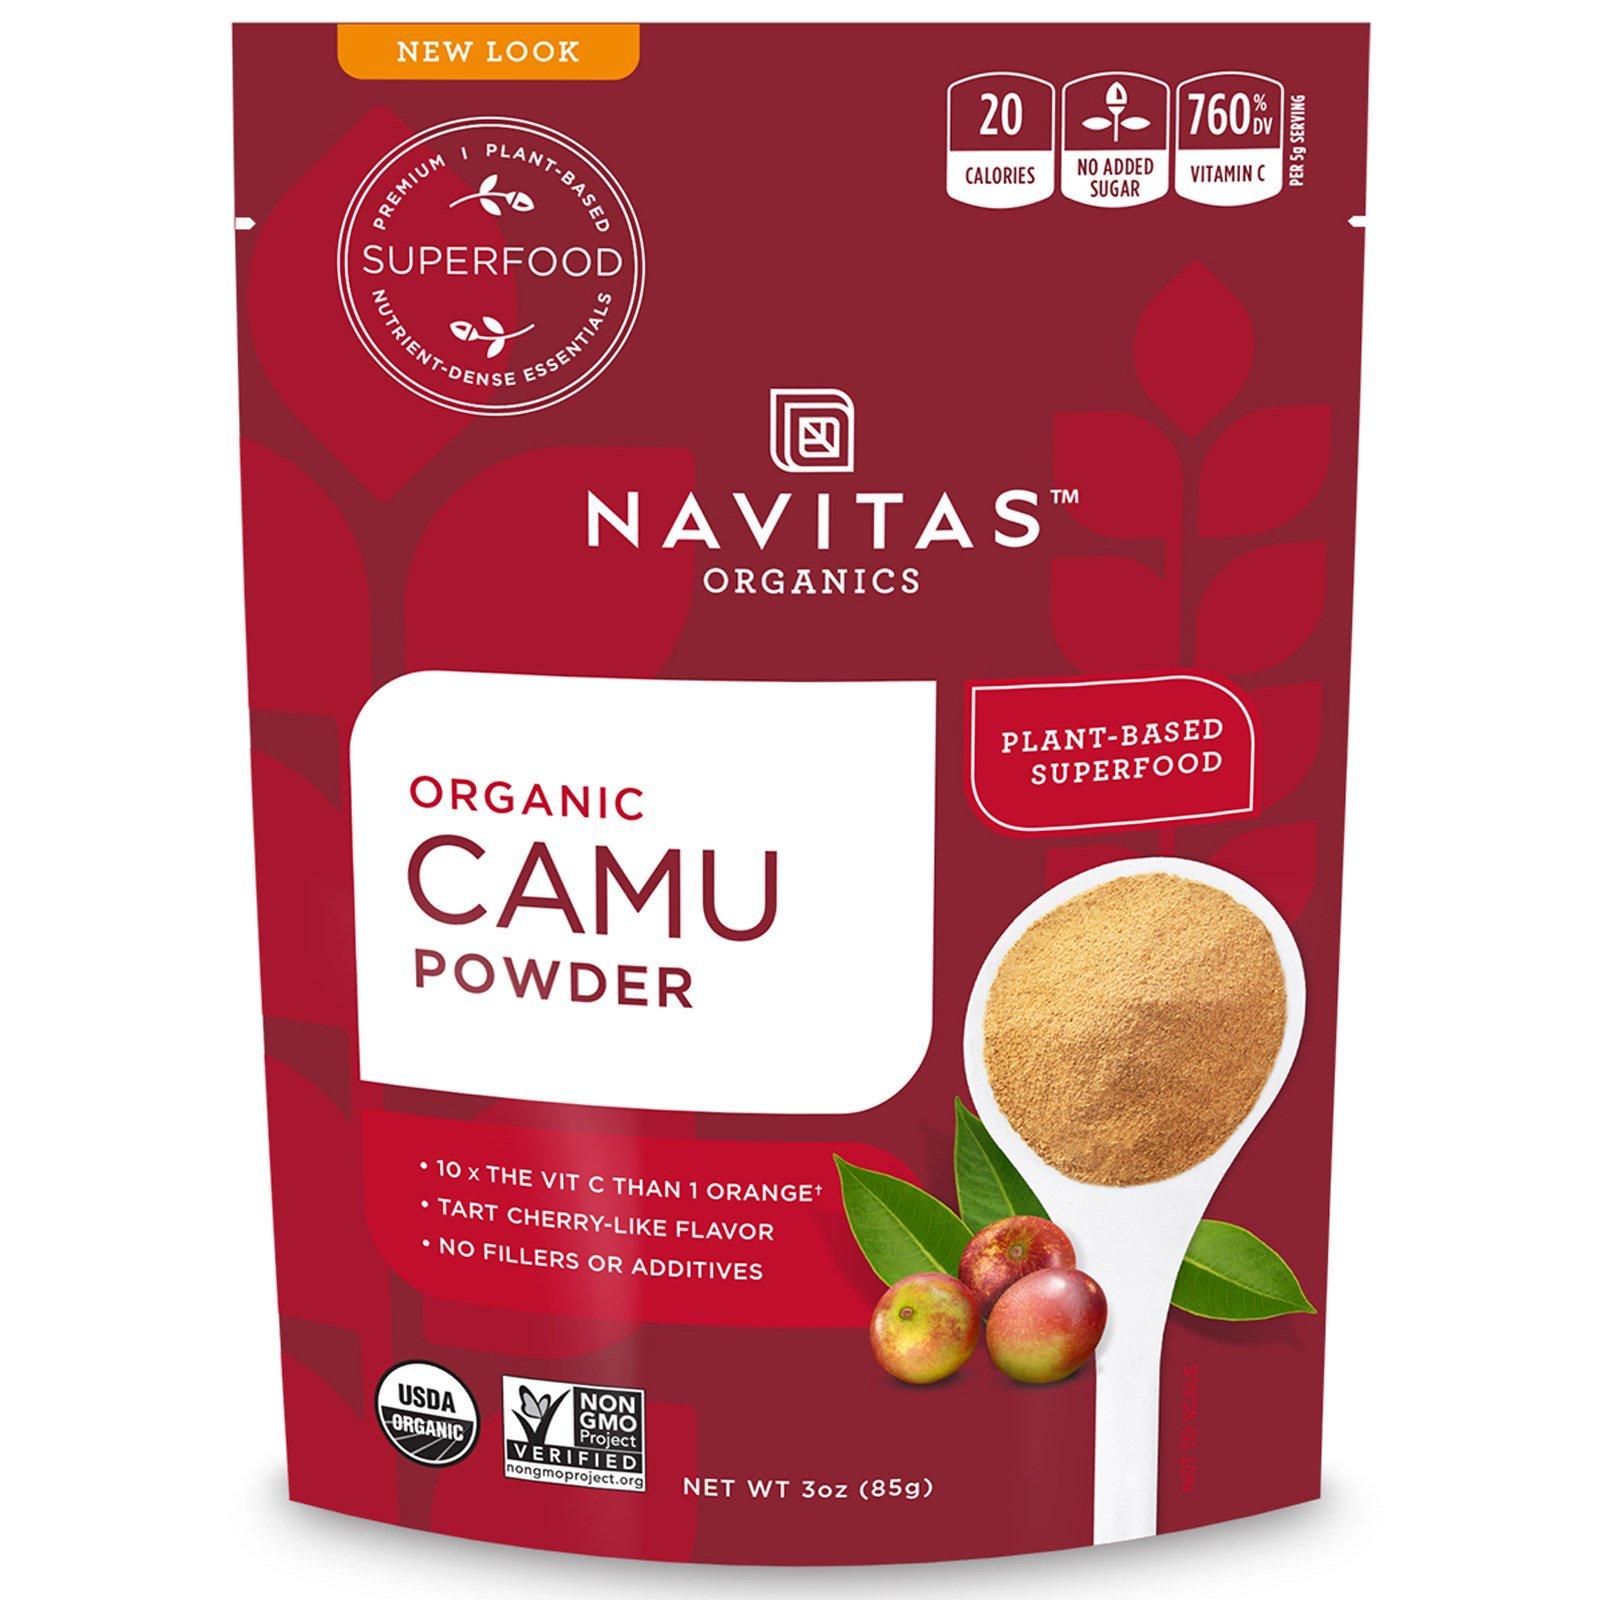 Navitas Organics, Organic, порошок камю, 3 унц. (85 г)